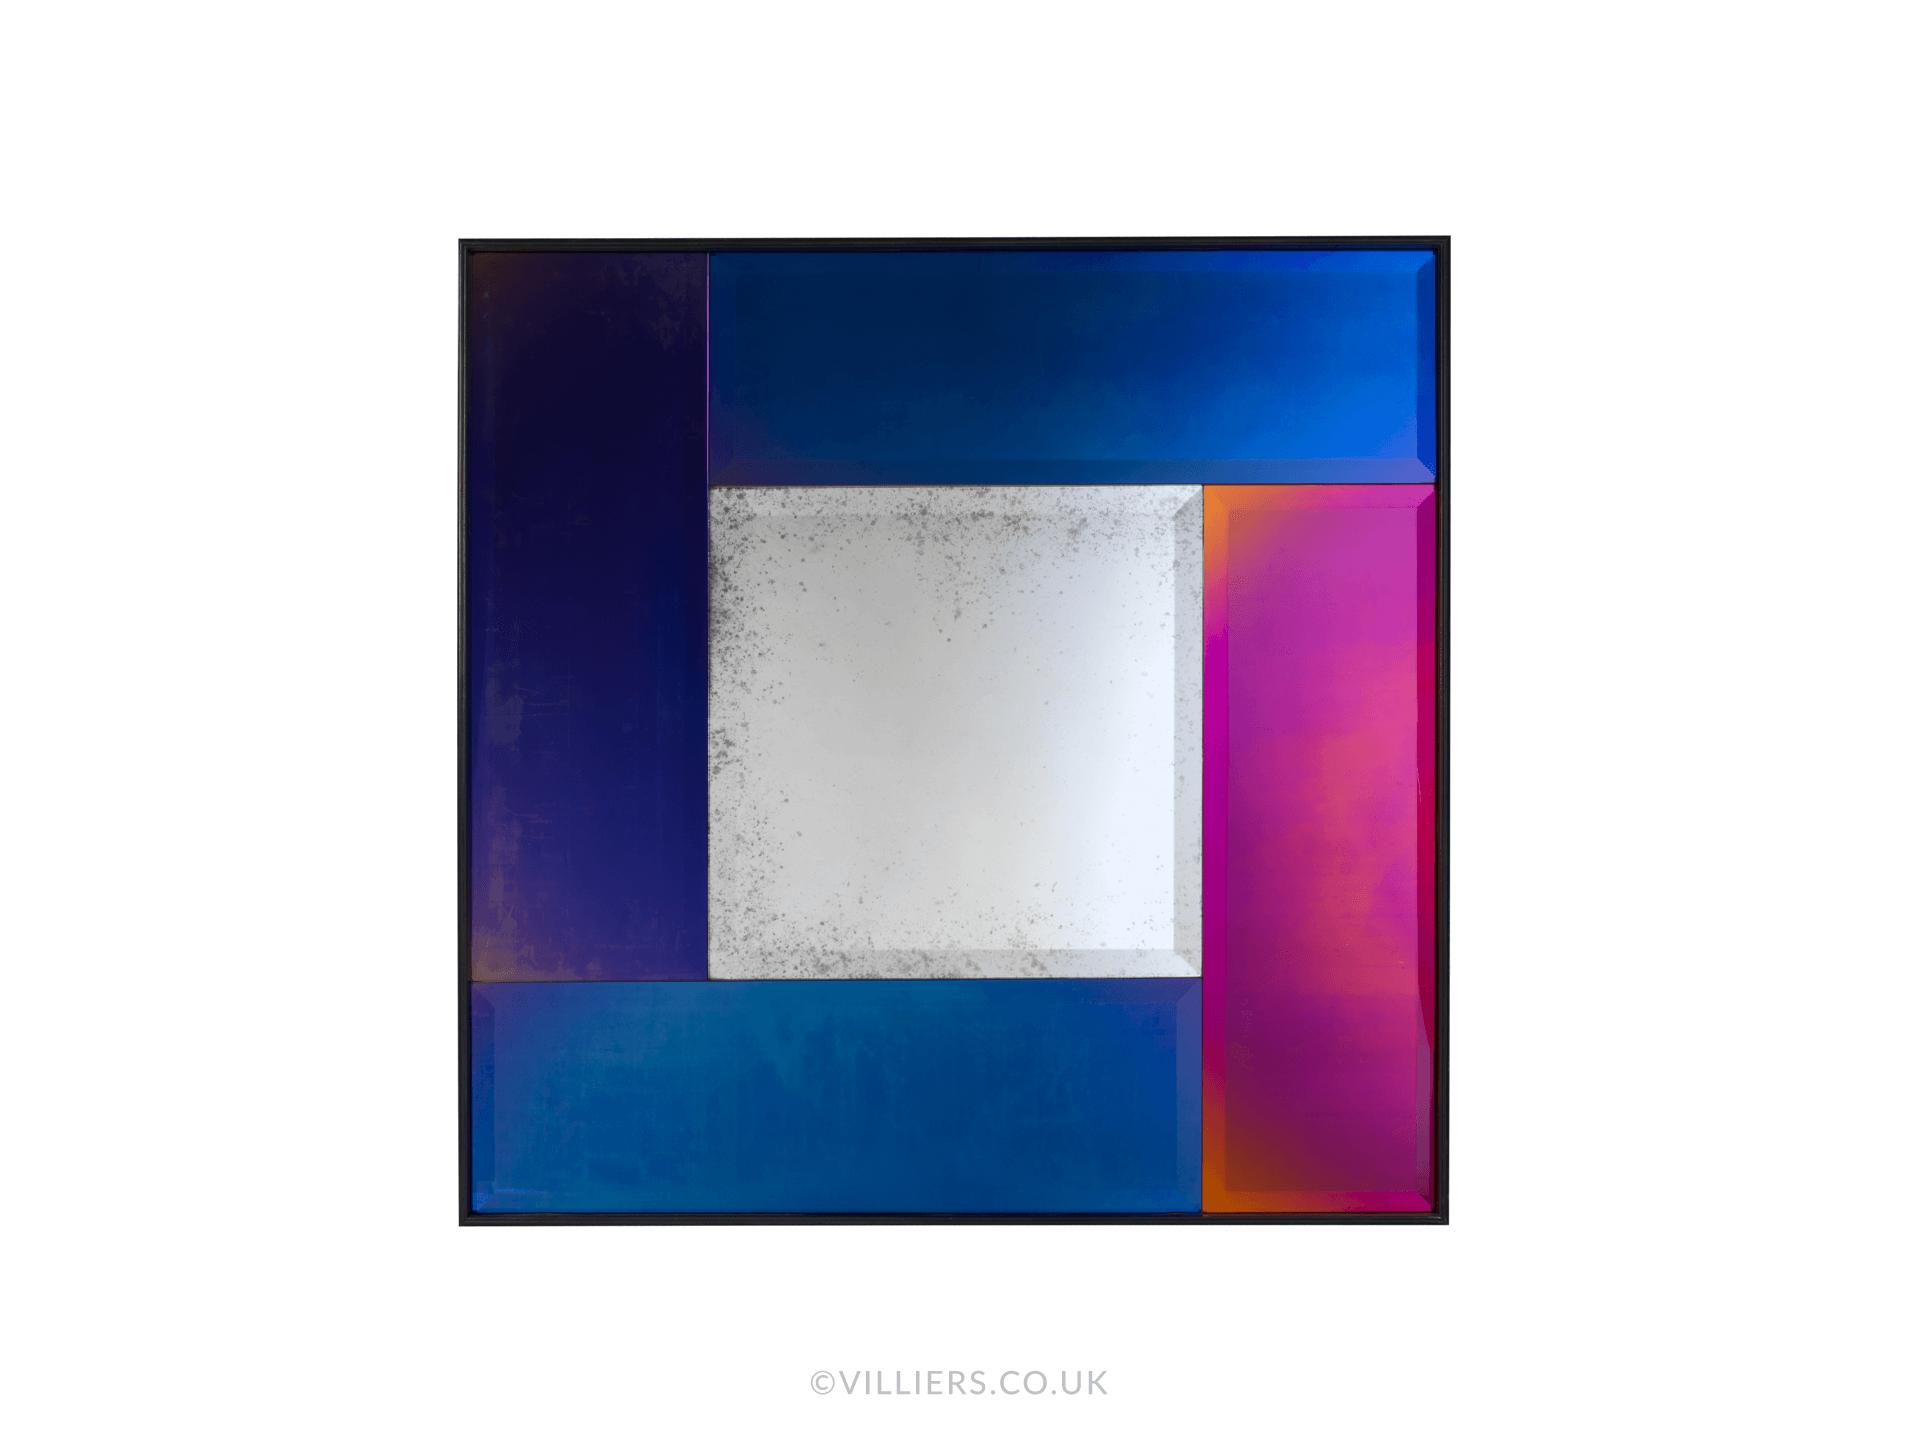 Swatch II Mirror